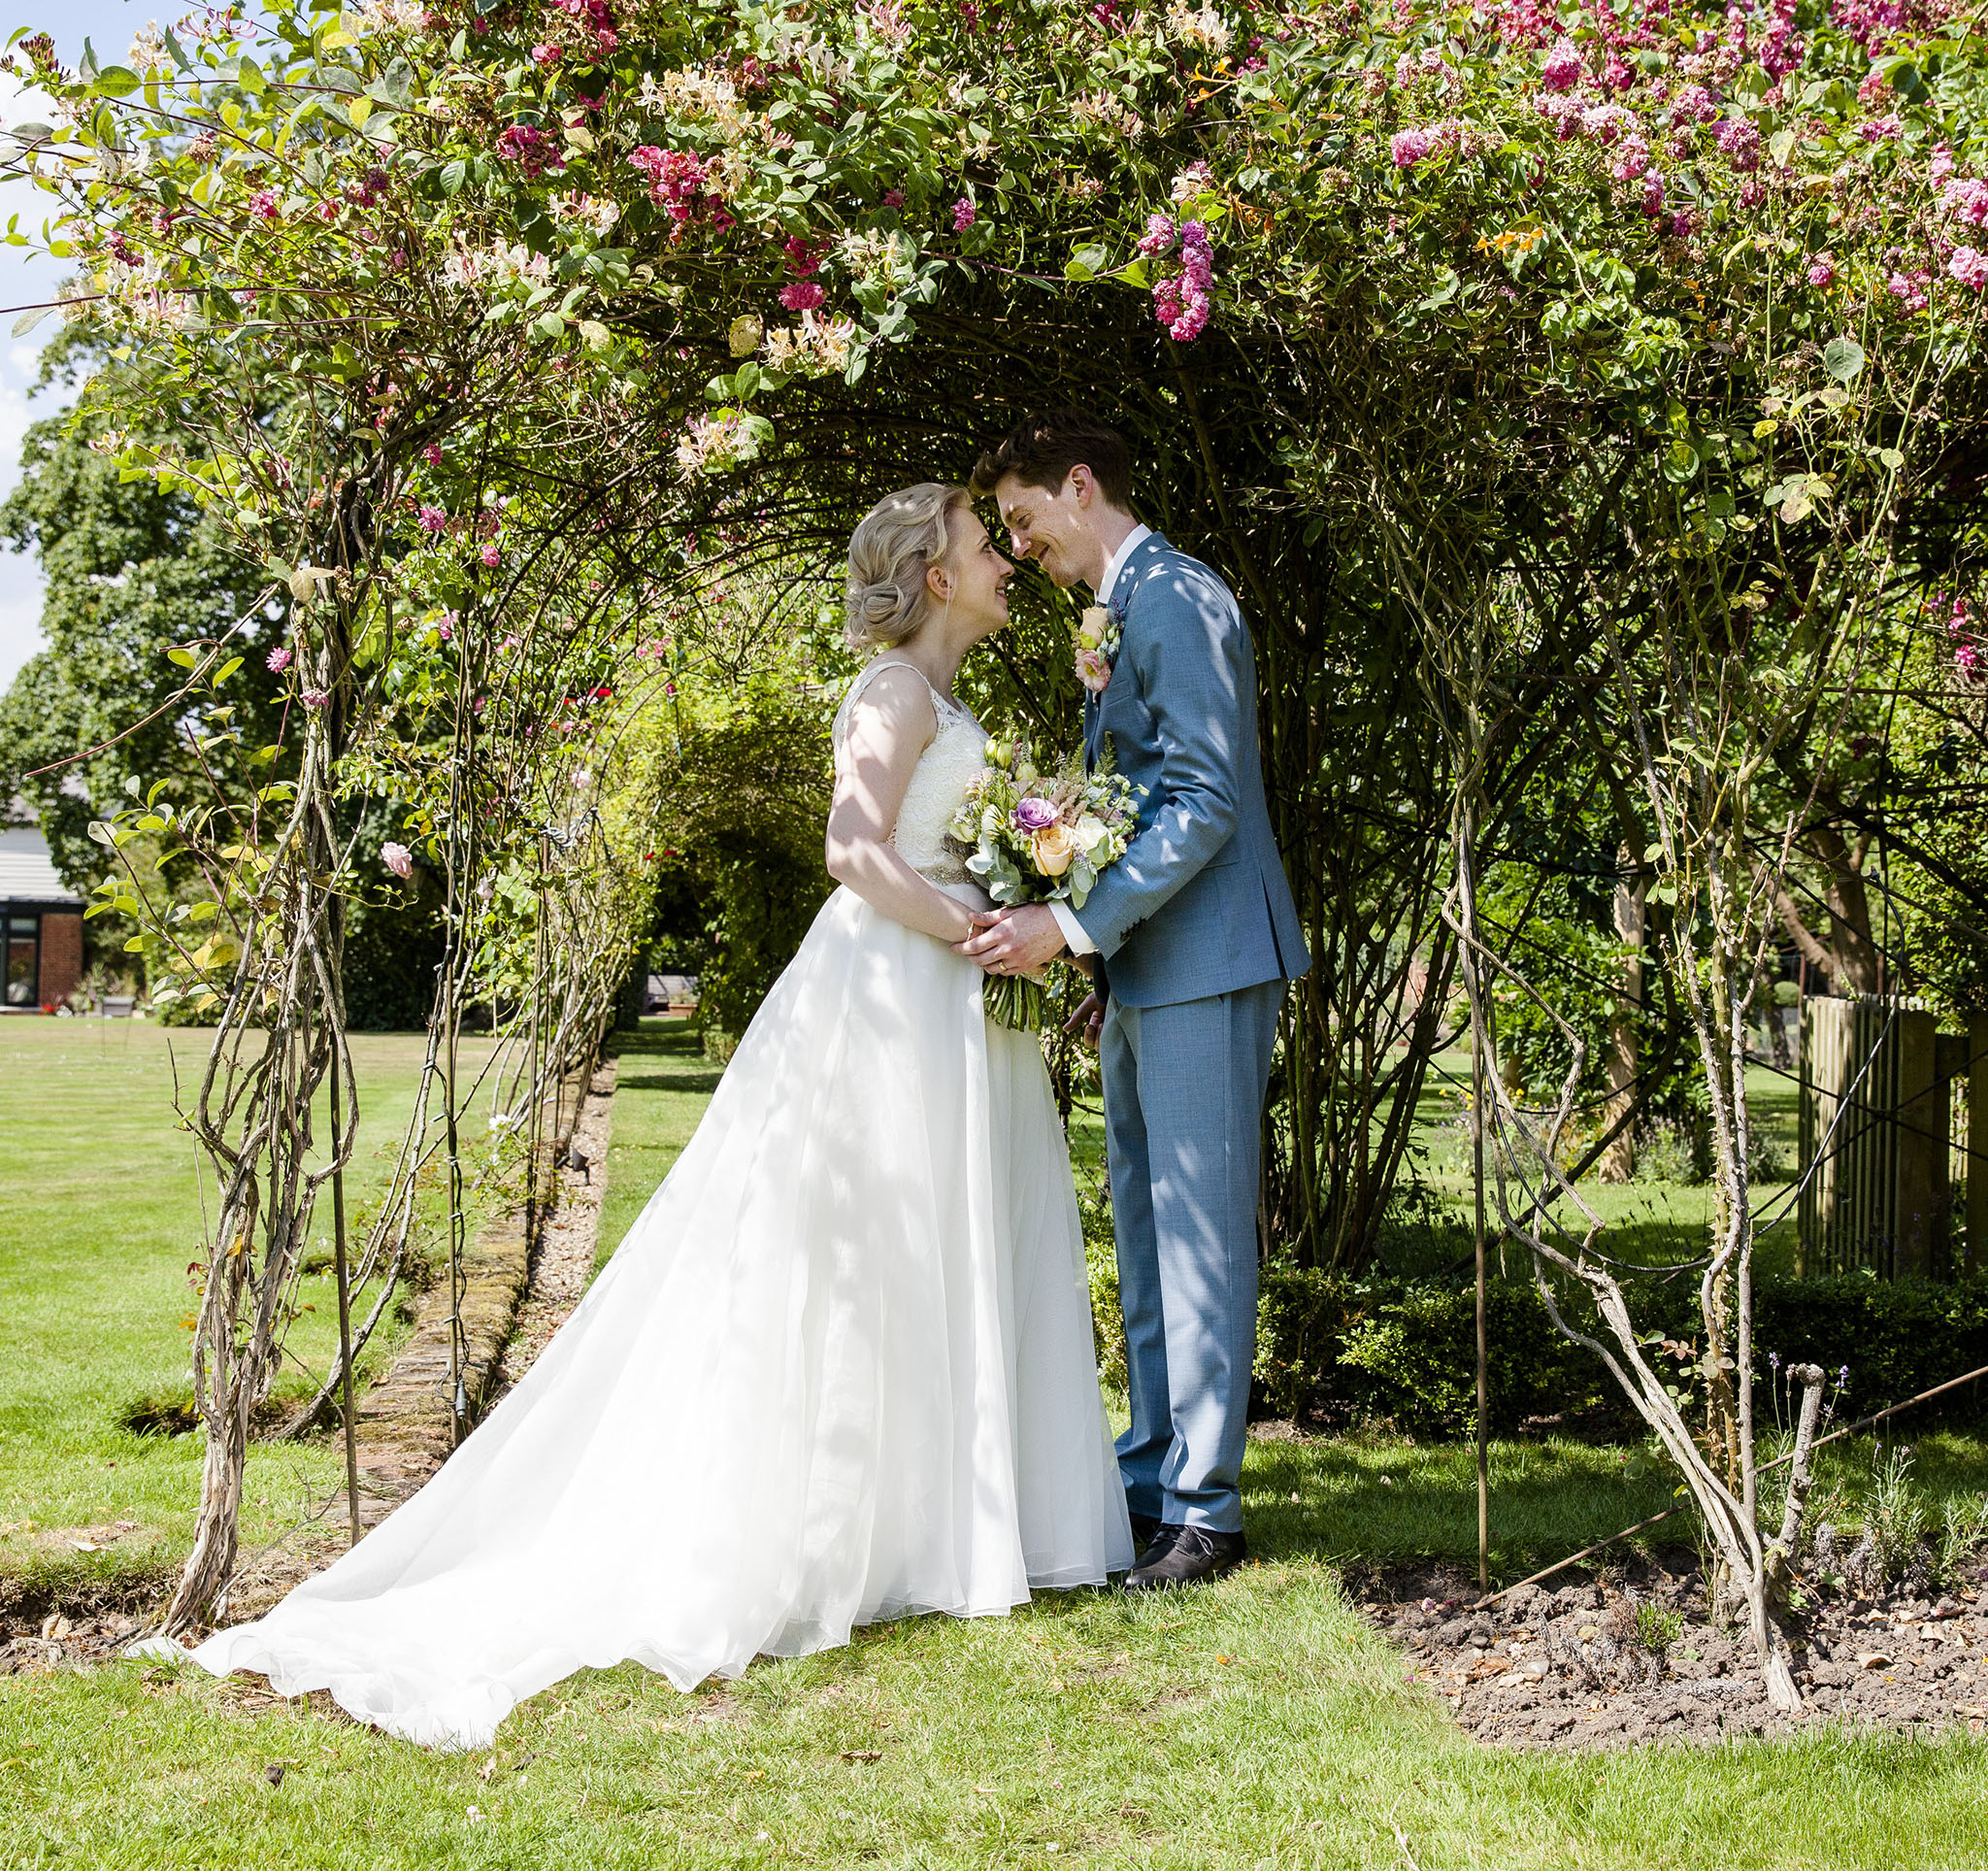 elizabethgphotography_kingslangley_hertfordshire_fineart_wedding_pottersbar_matt_katie_pegg_32.jpg